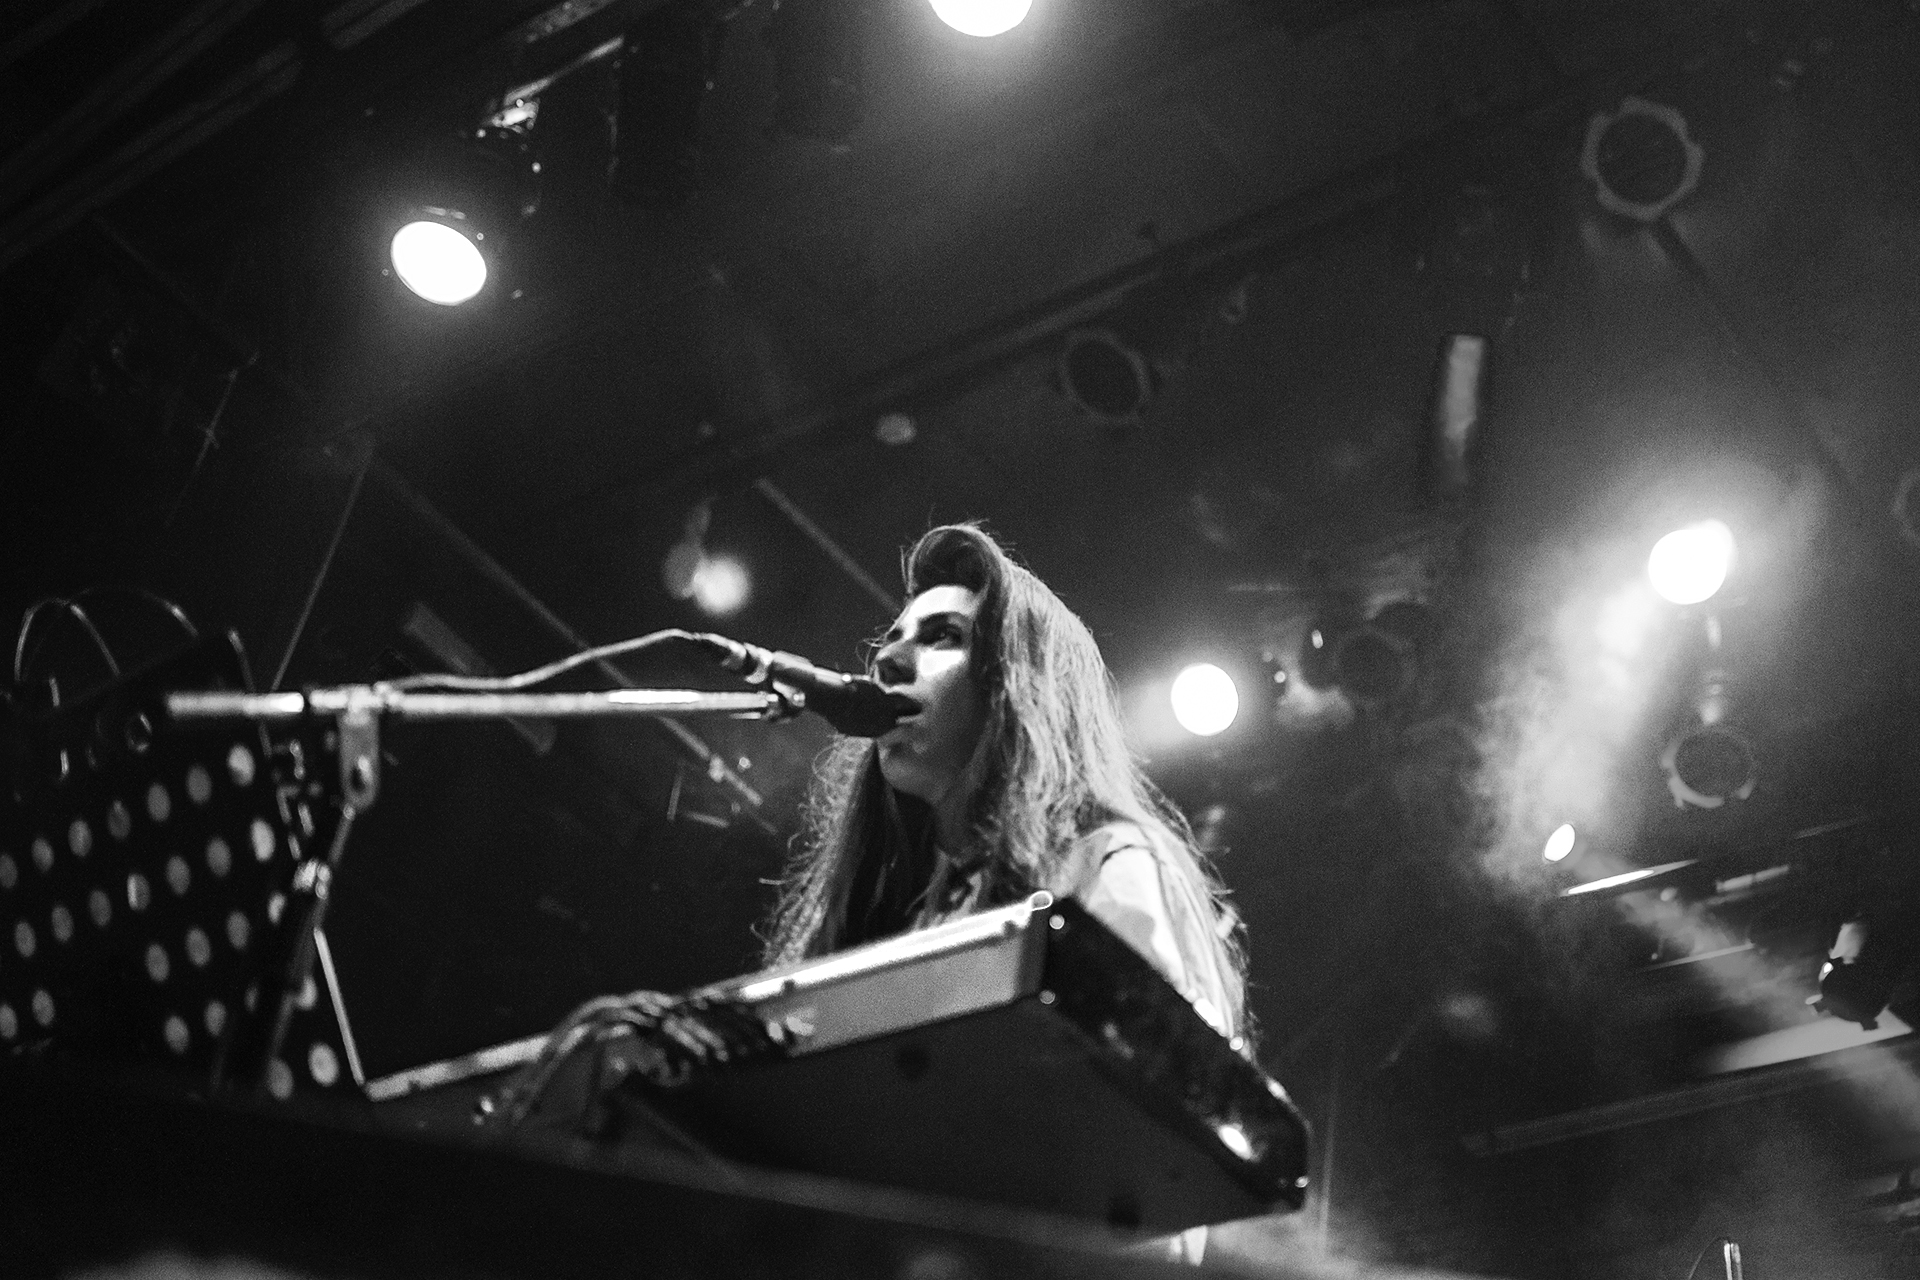 julia_holter_niceto_7_10_16_indie_hoy_tamara_larranaga_10